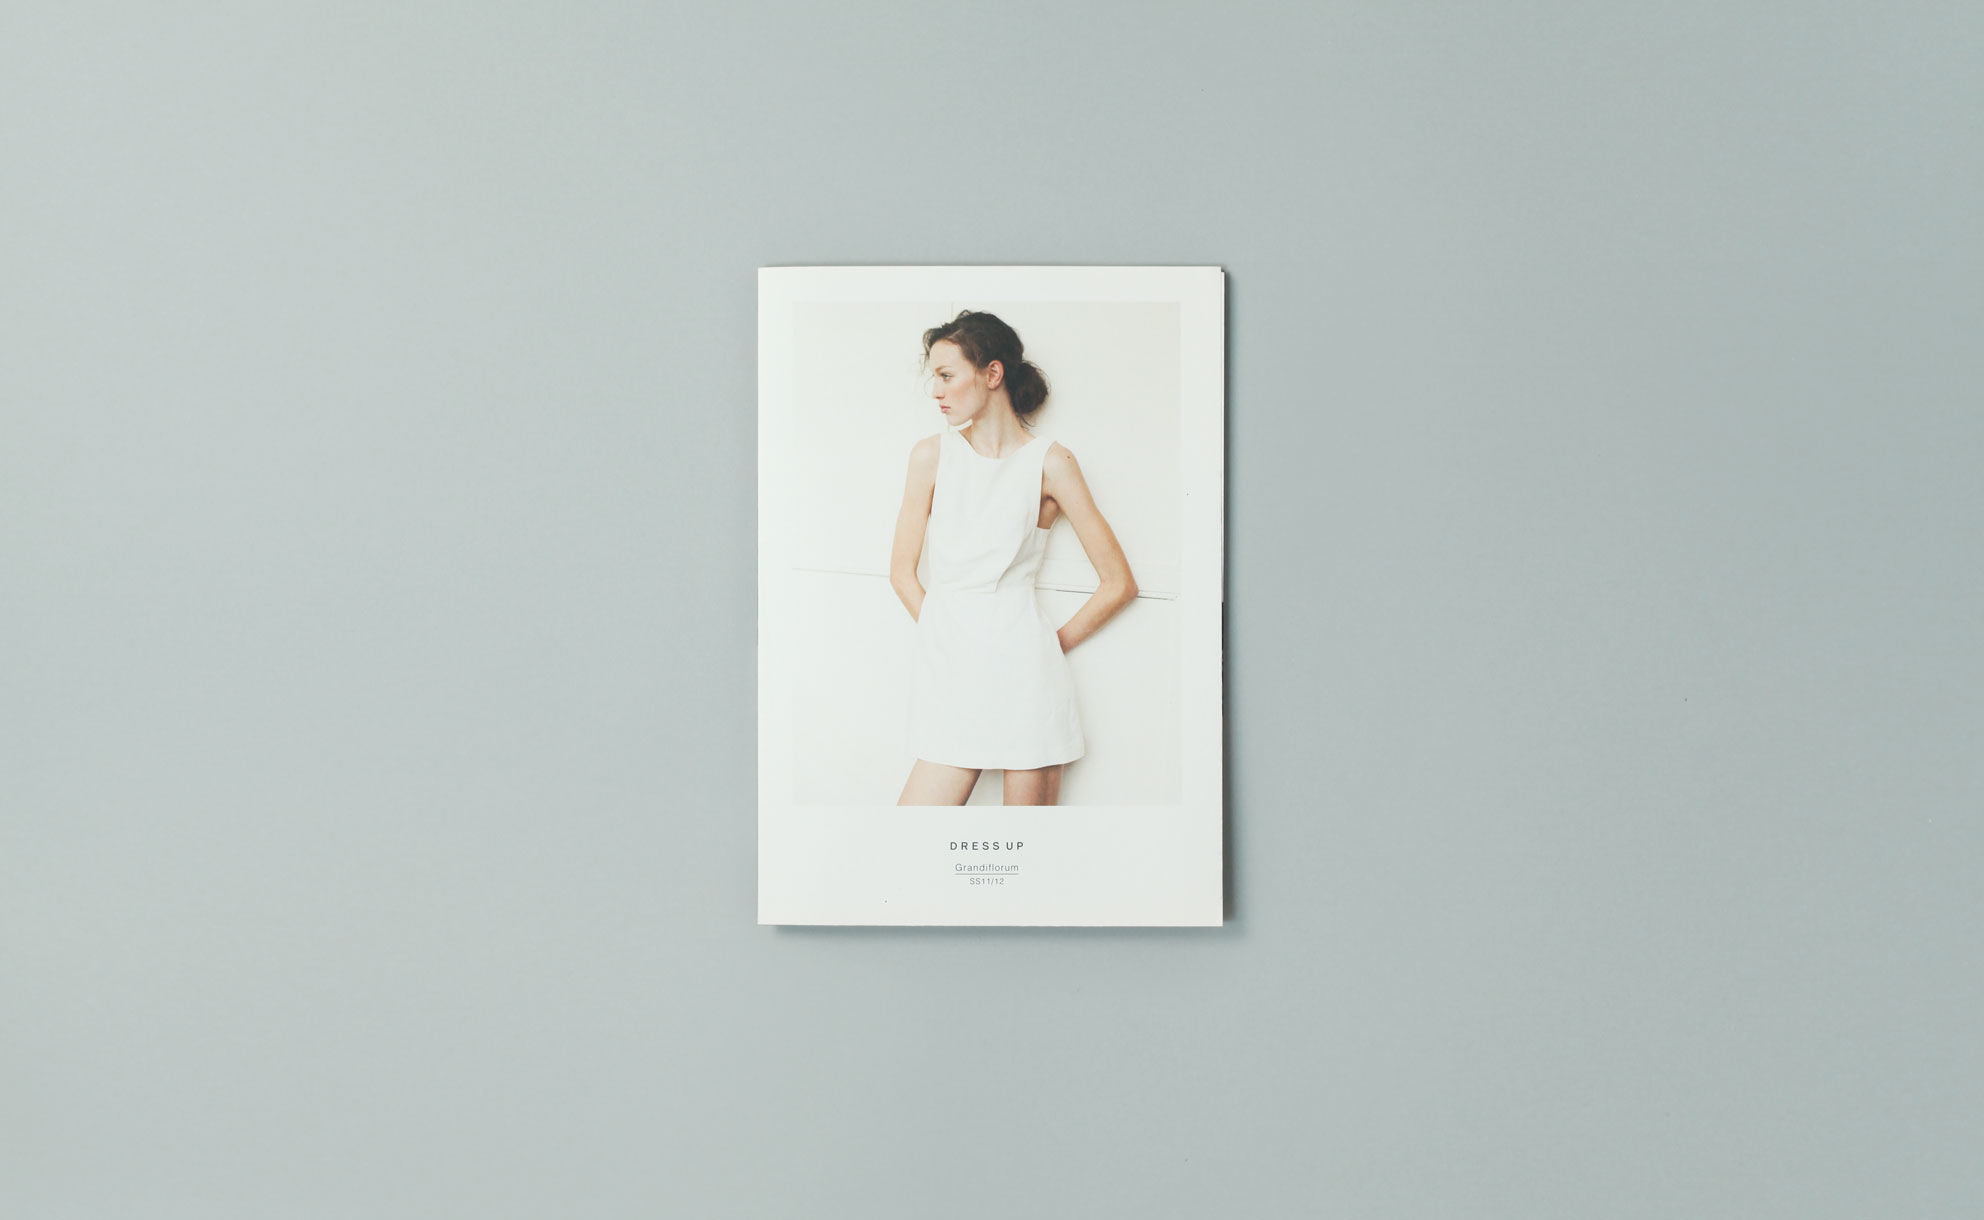 Dress Up - Grandiflorum Cover